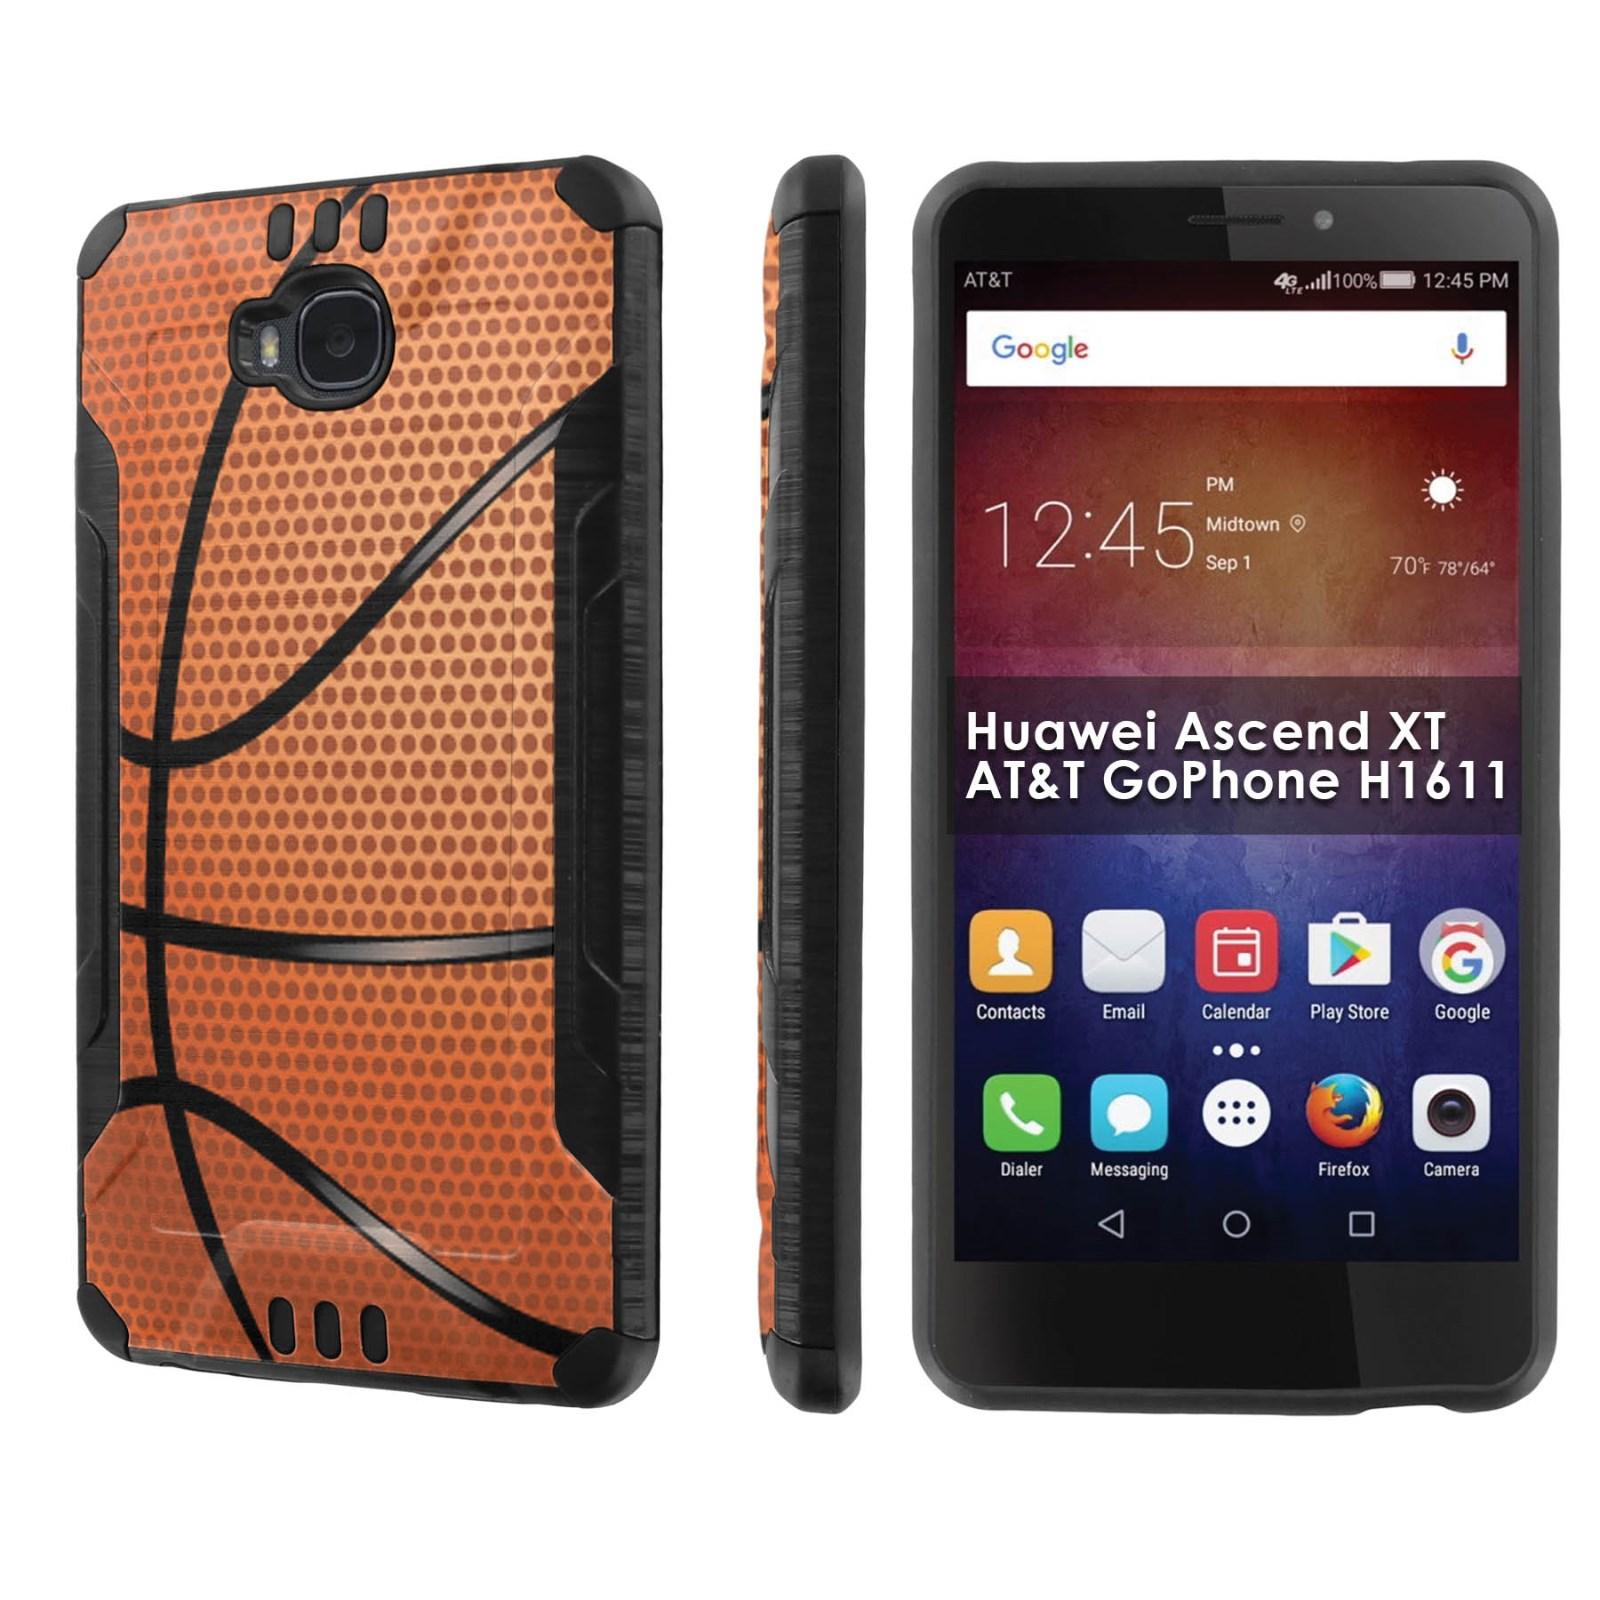 Huawei ascend xt2 update